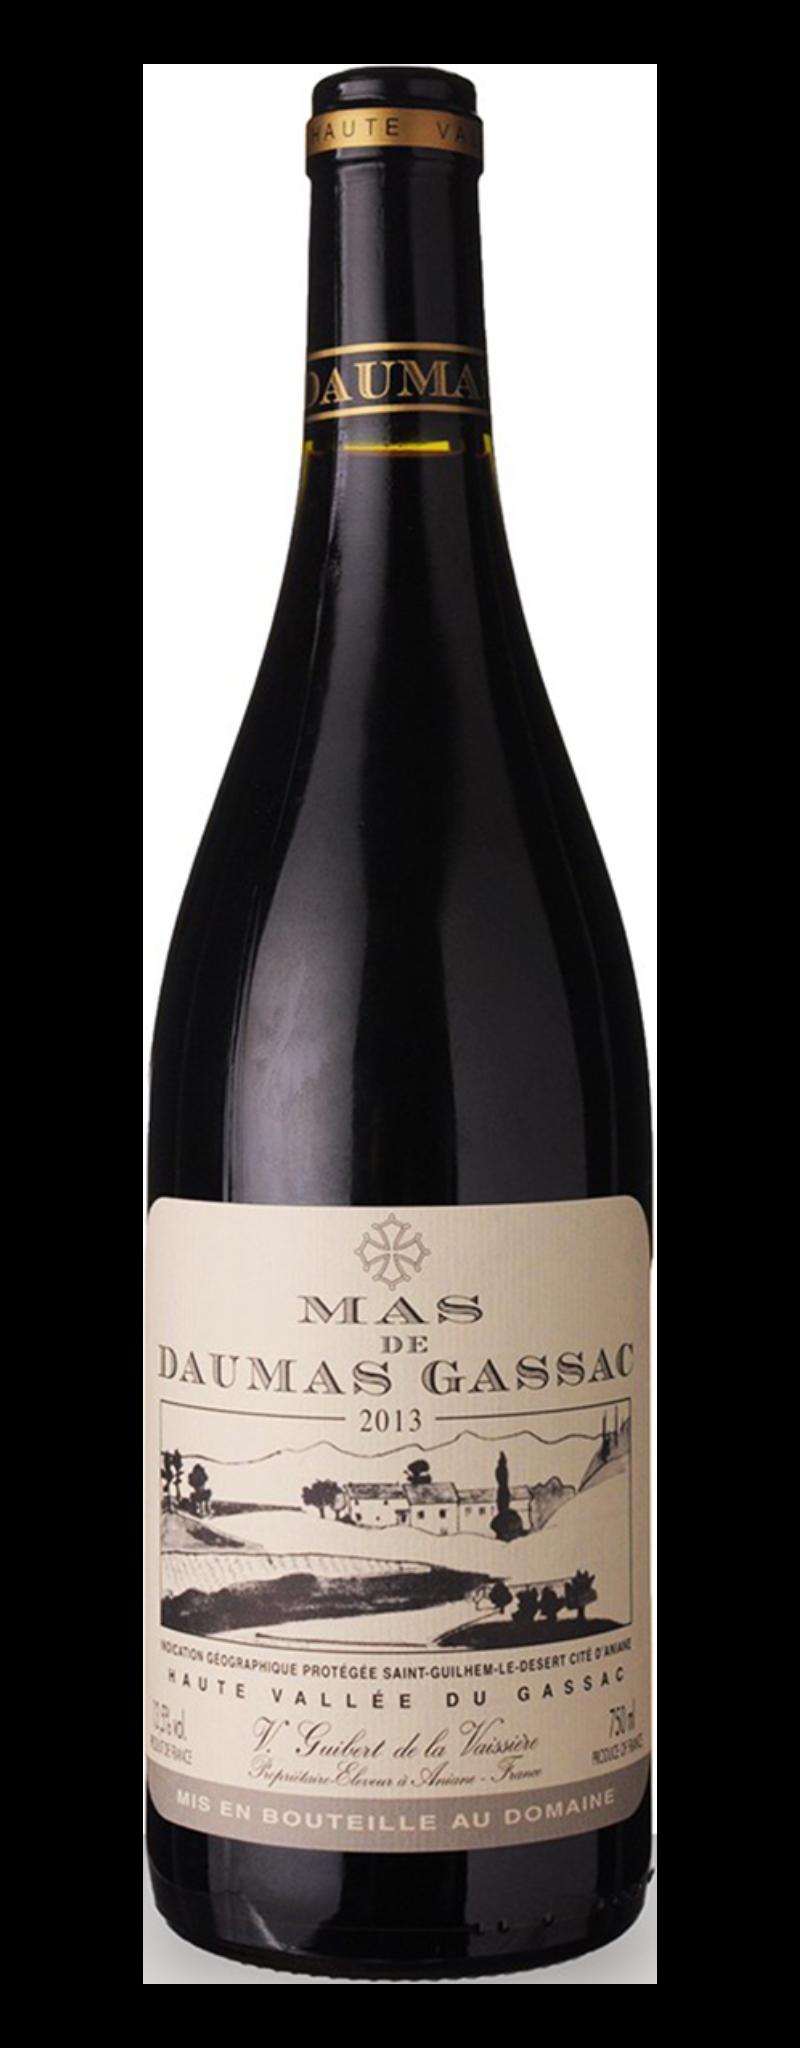 Mas de Daumas Gassac, IGP Saint-Guilhem-le-desert  cite d'Aniane  - 750ml